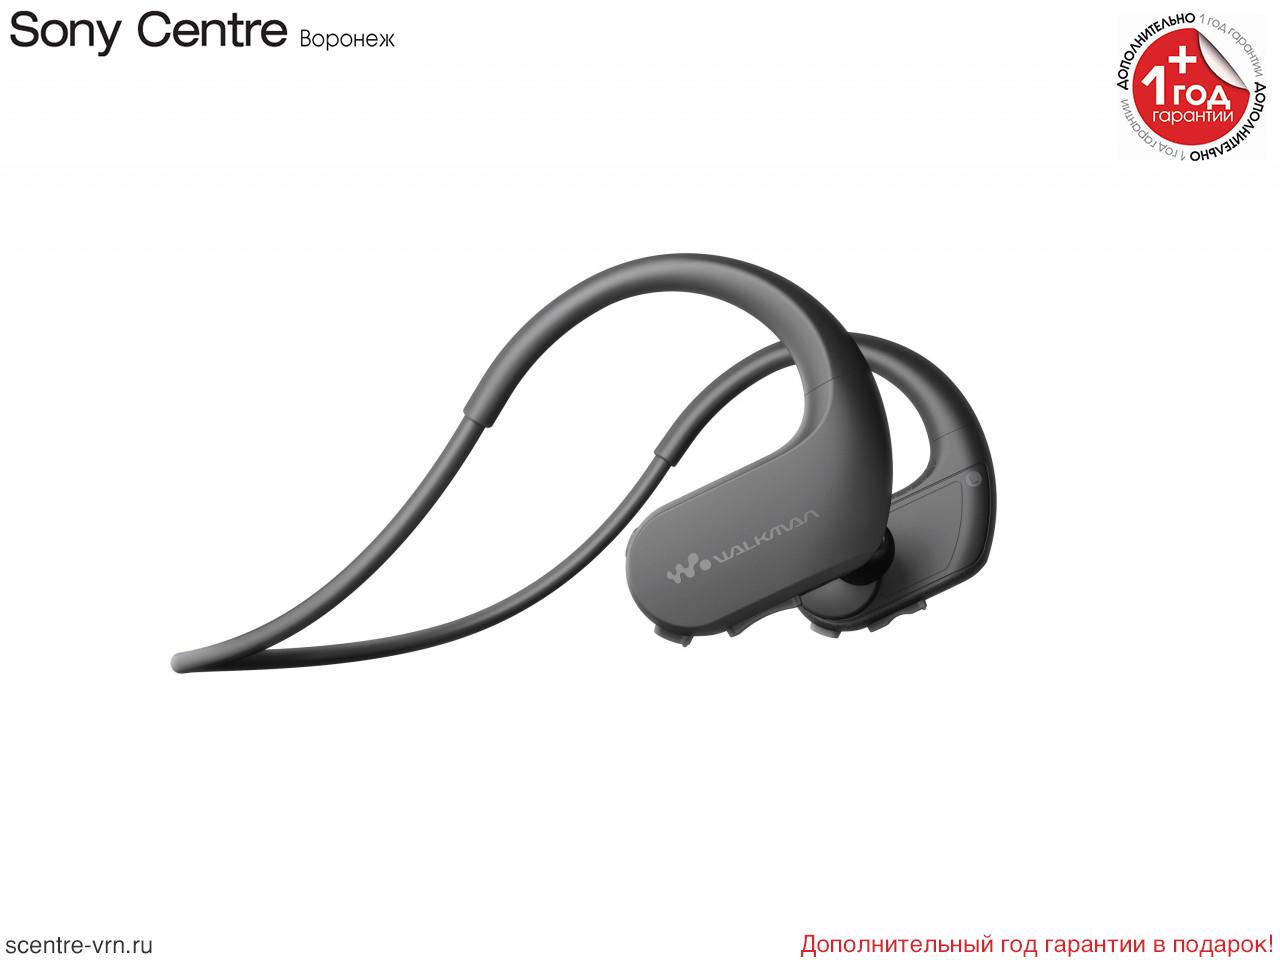 Спортивный плеер Sony NW-WS413 чёрного цвета